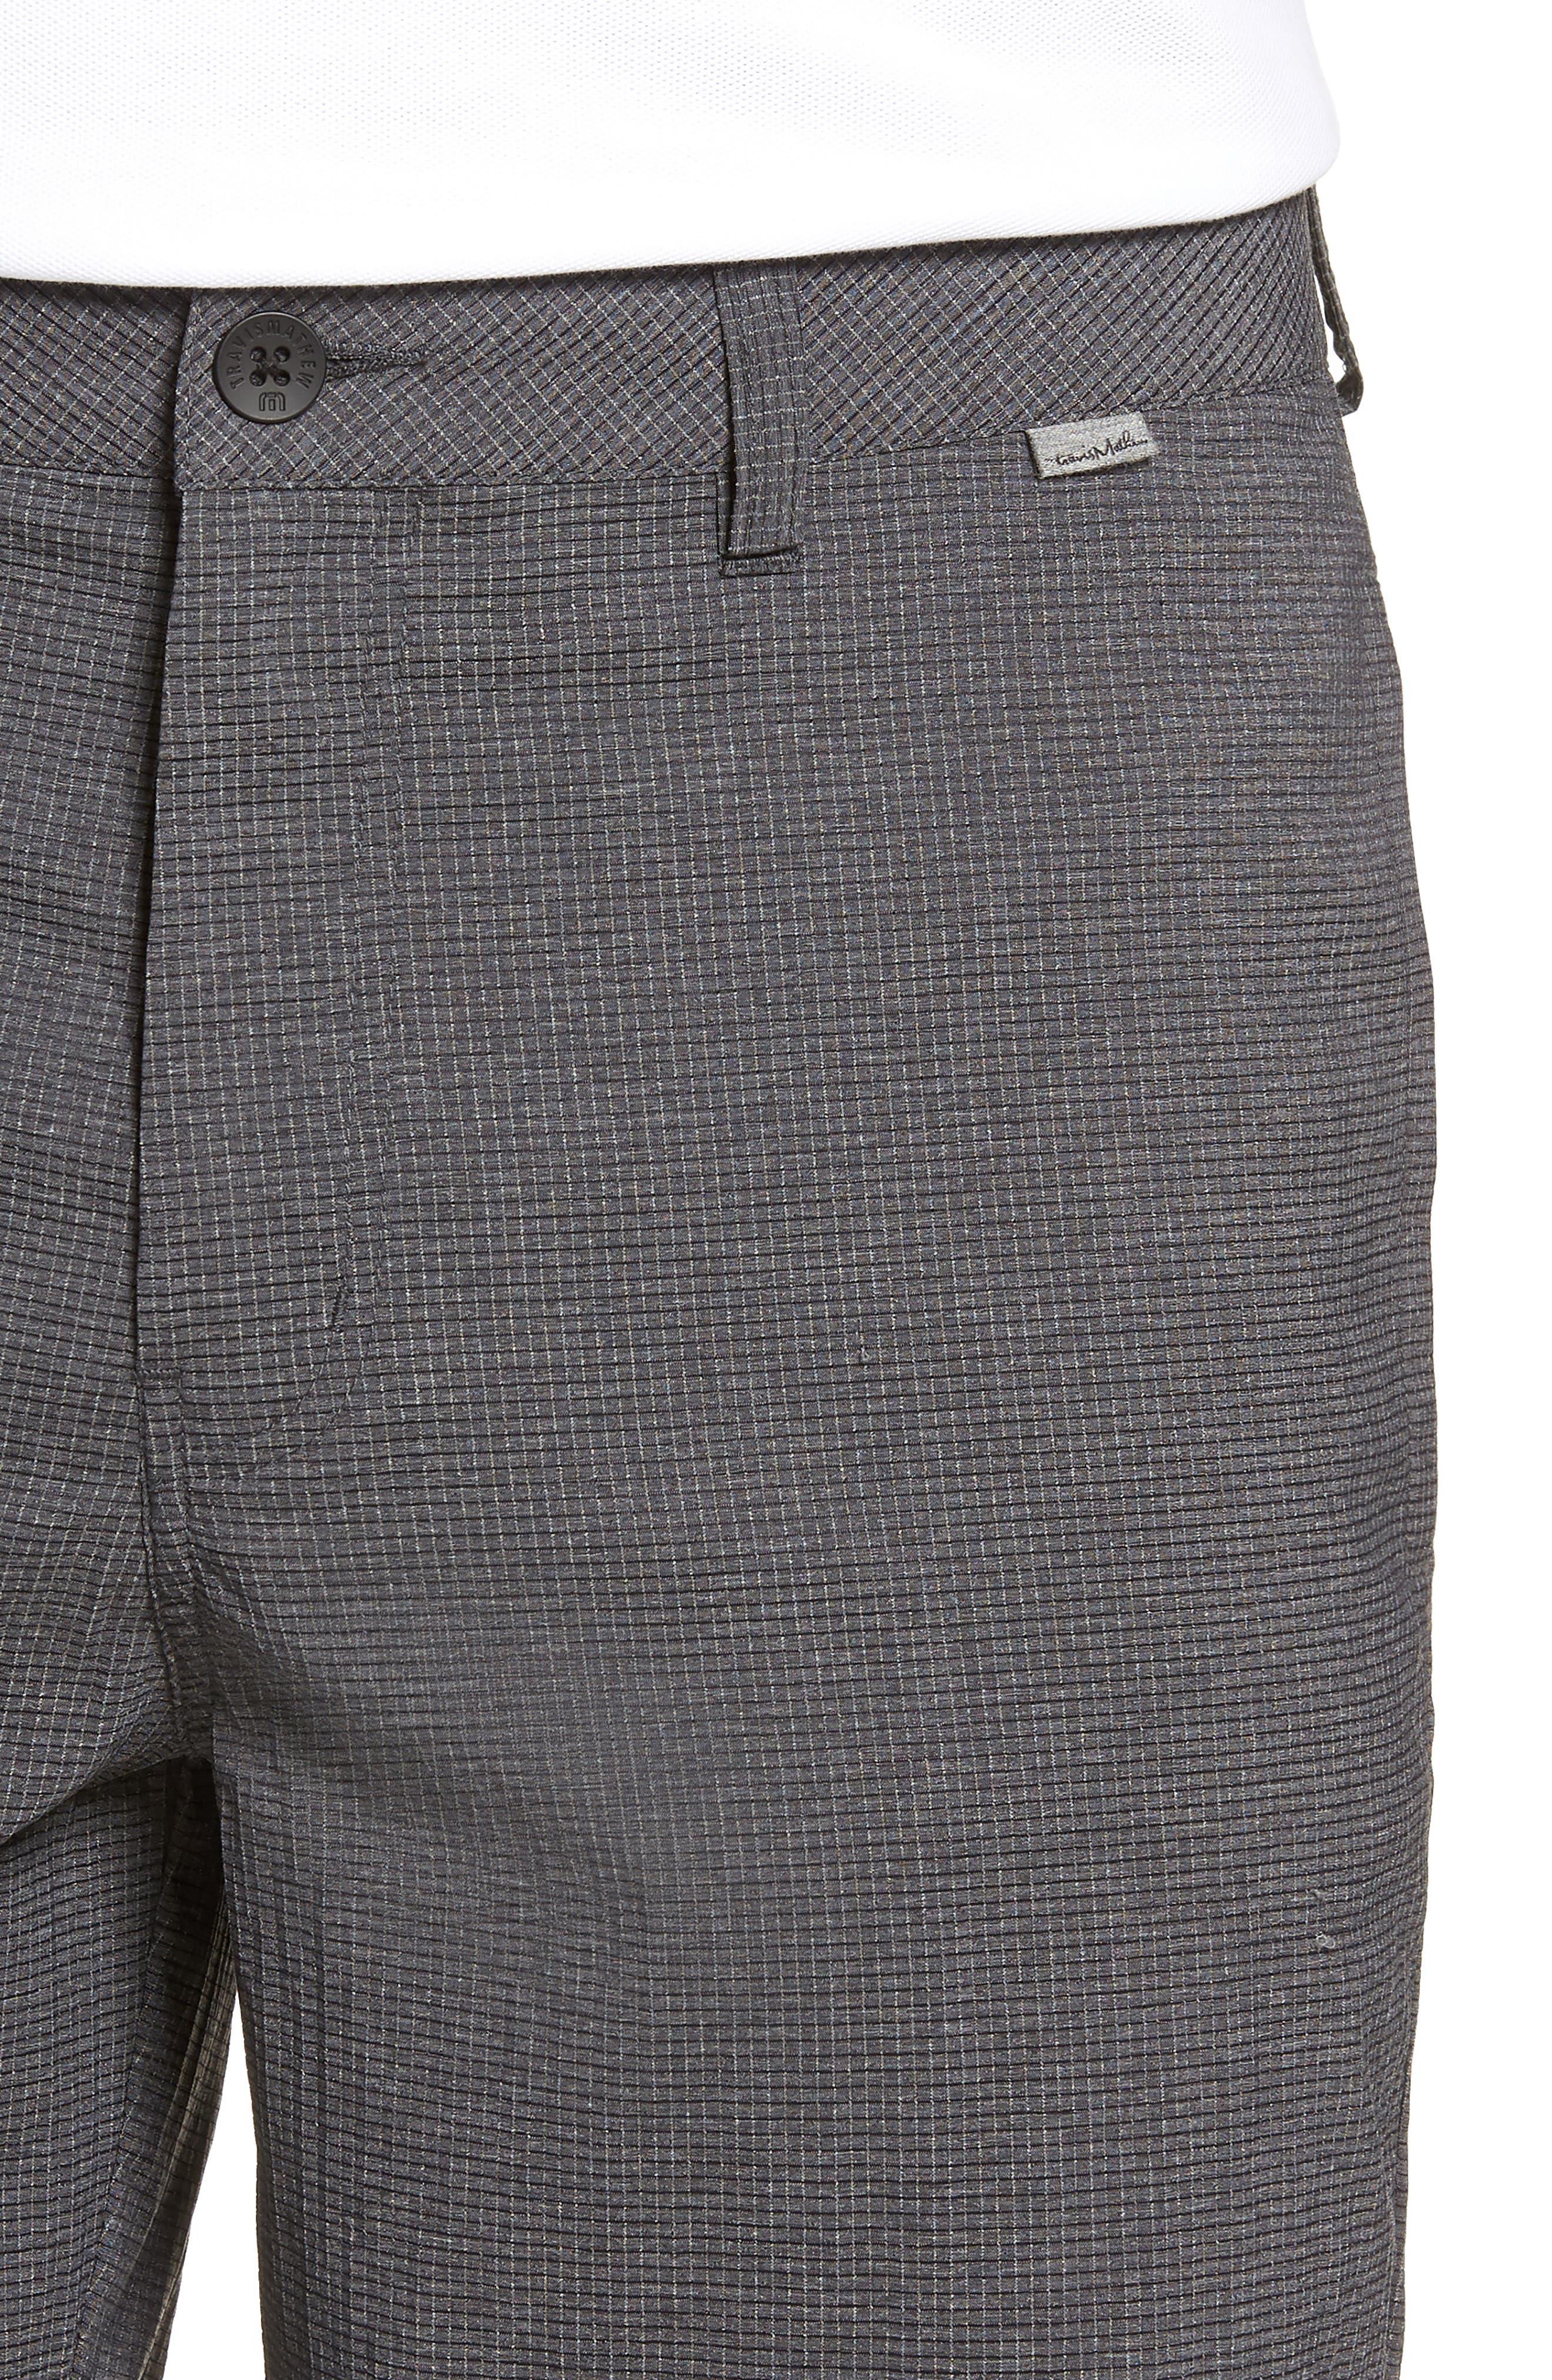 Peel Out Shorts,                             Alternate thumbnail 4, color,                             GREY PINSTRIPE